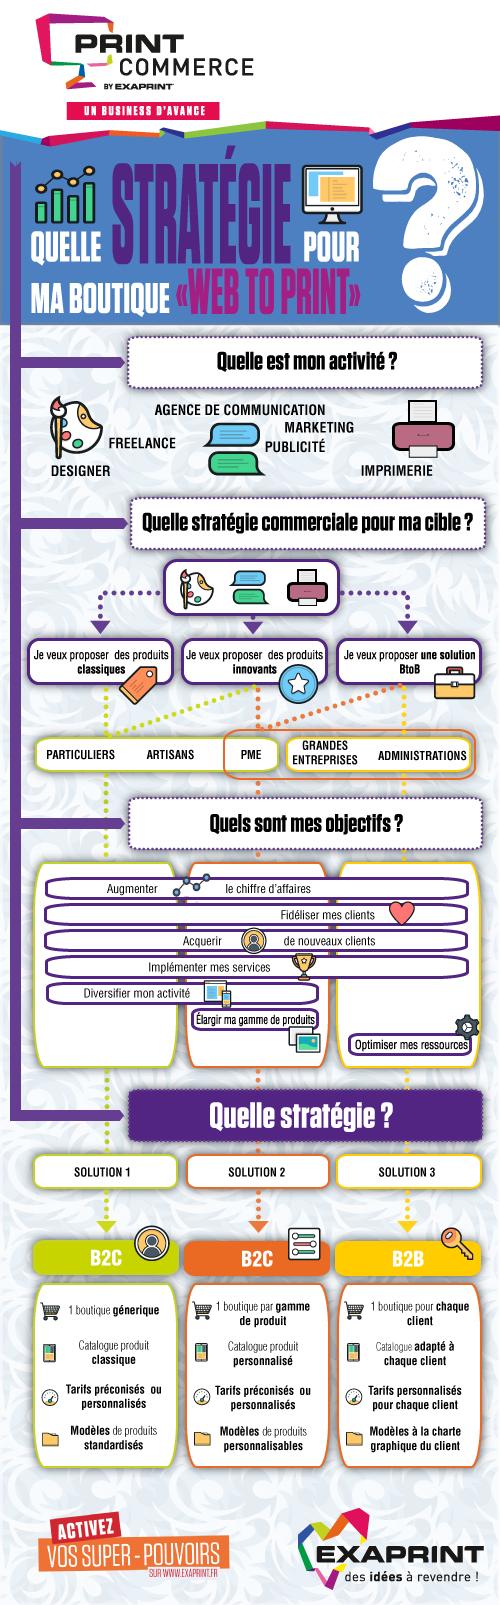 https://blog.exaprint.fr/wp-content/uploads/2015/11/Infographie_Strategie.png